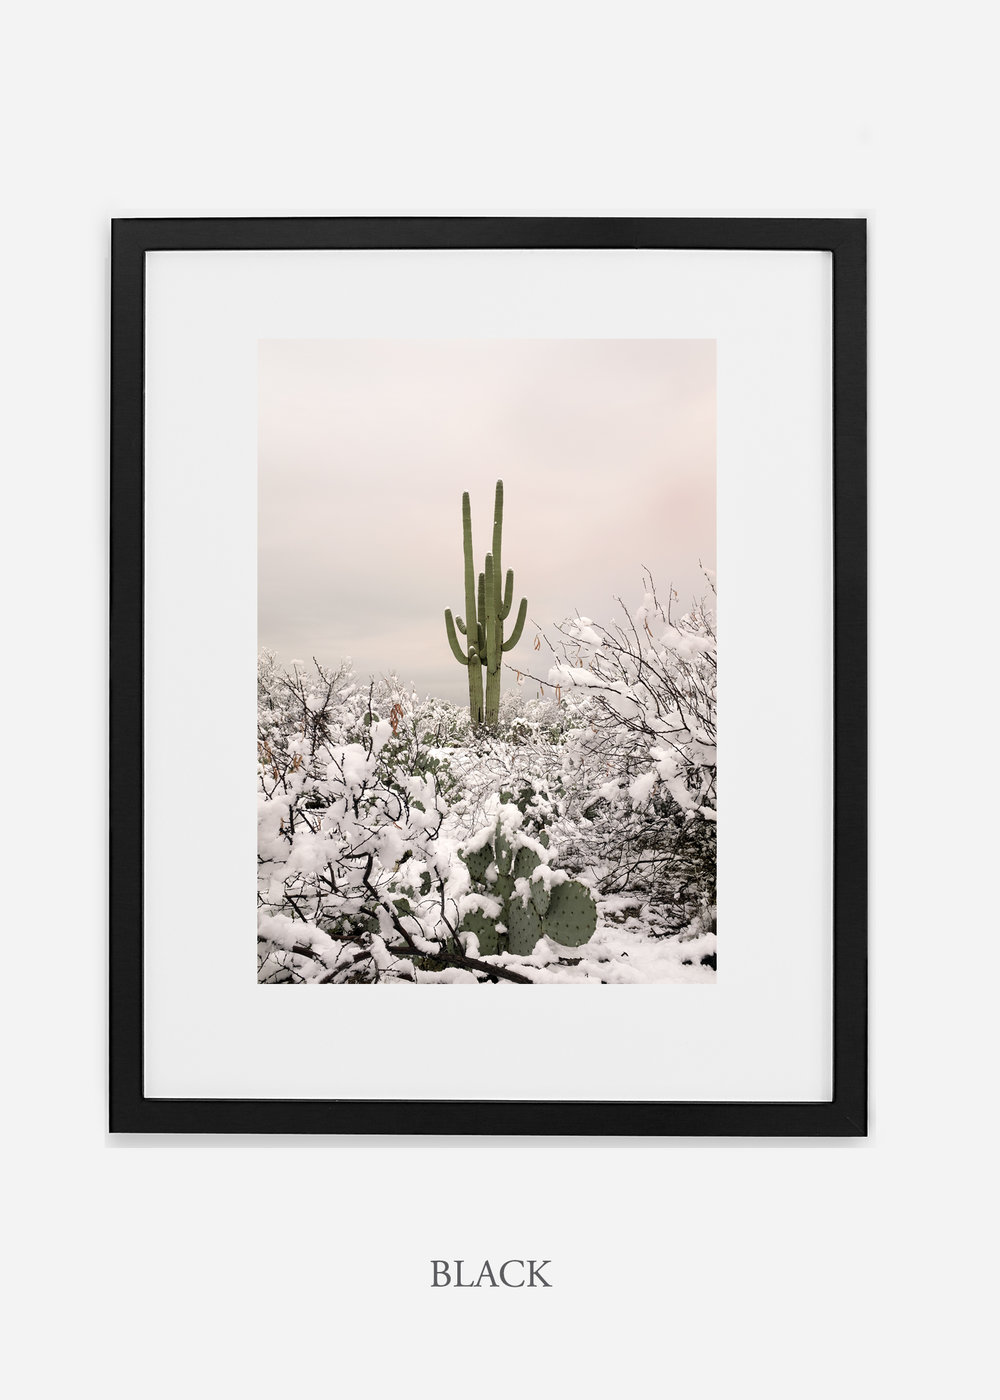 blackframe-saguaroNo.2-wildercalifornia-art-wallart-cactusprint-homedecor-prints-arizona-botanical-artwork-interiordesign.jpg